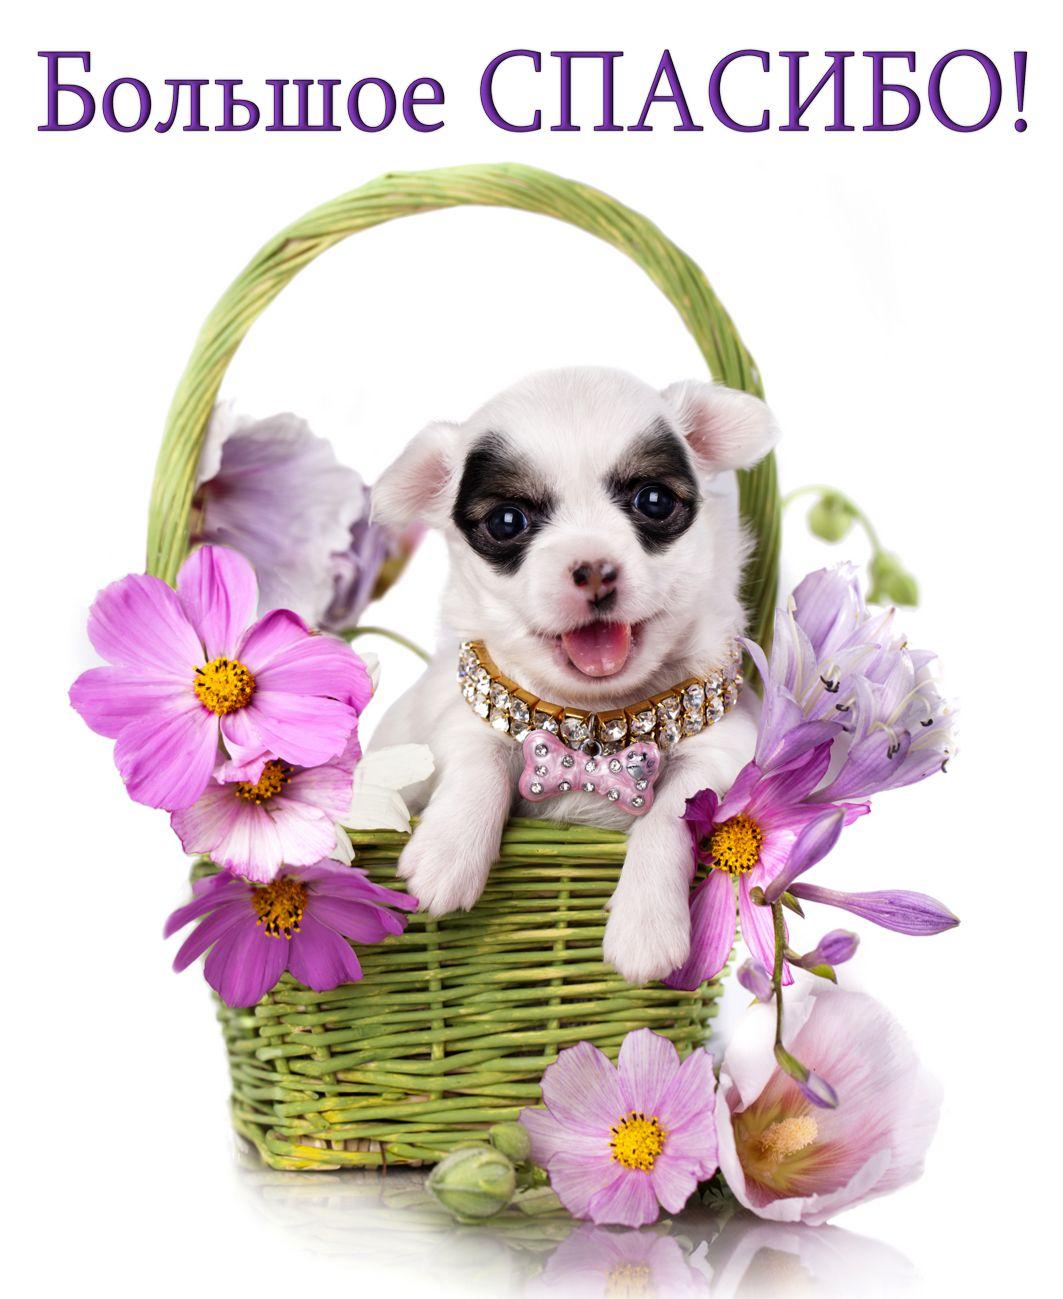 Открытка спасибо - собачка в корзинке с цветами